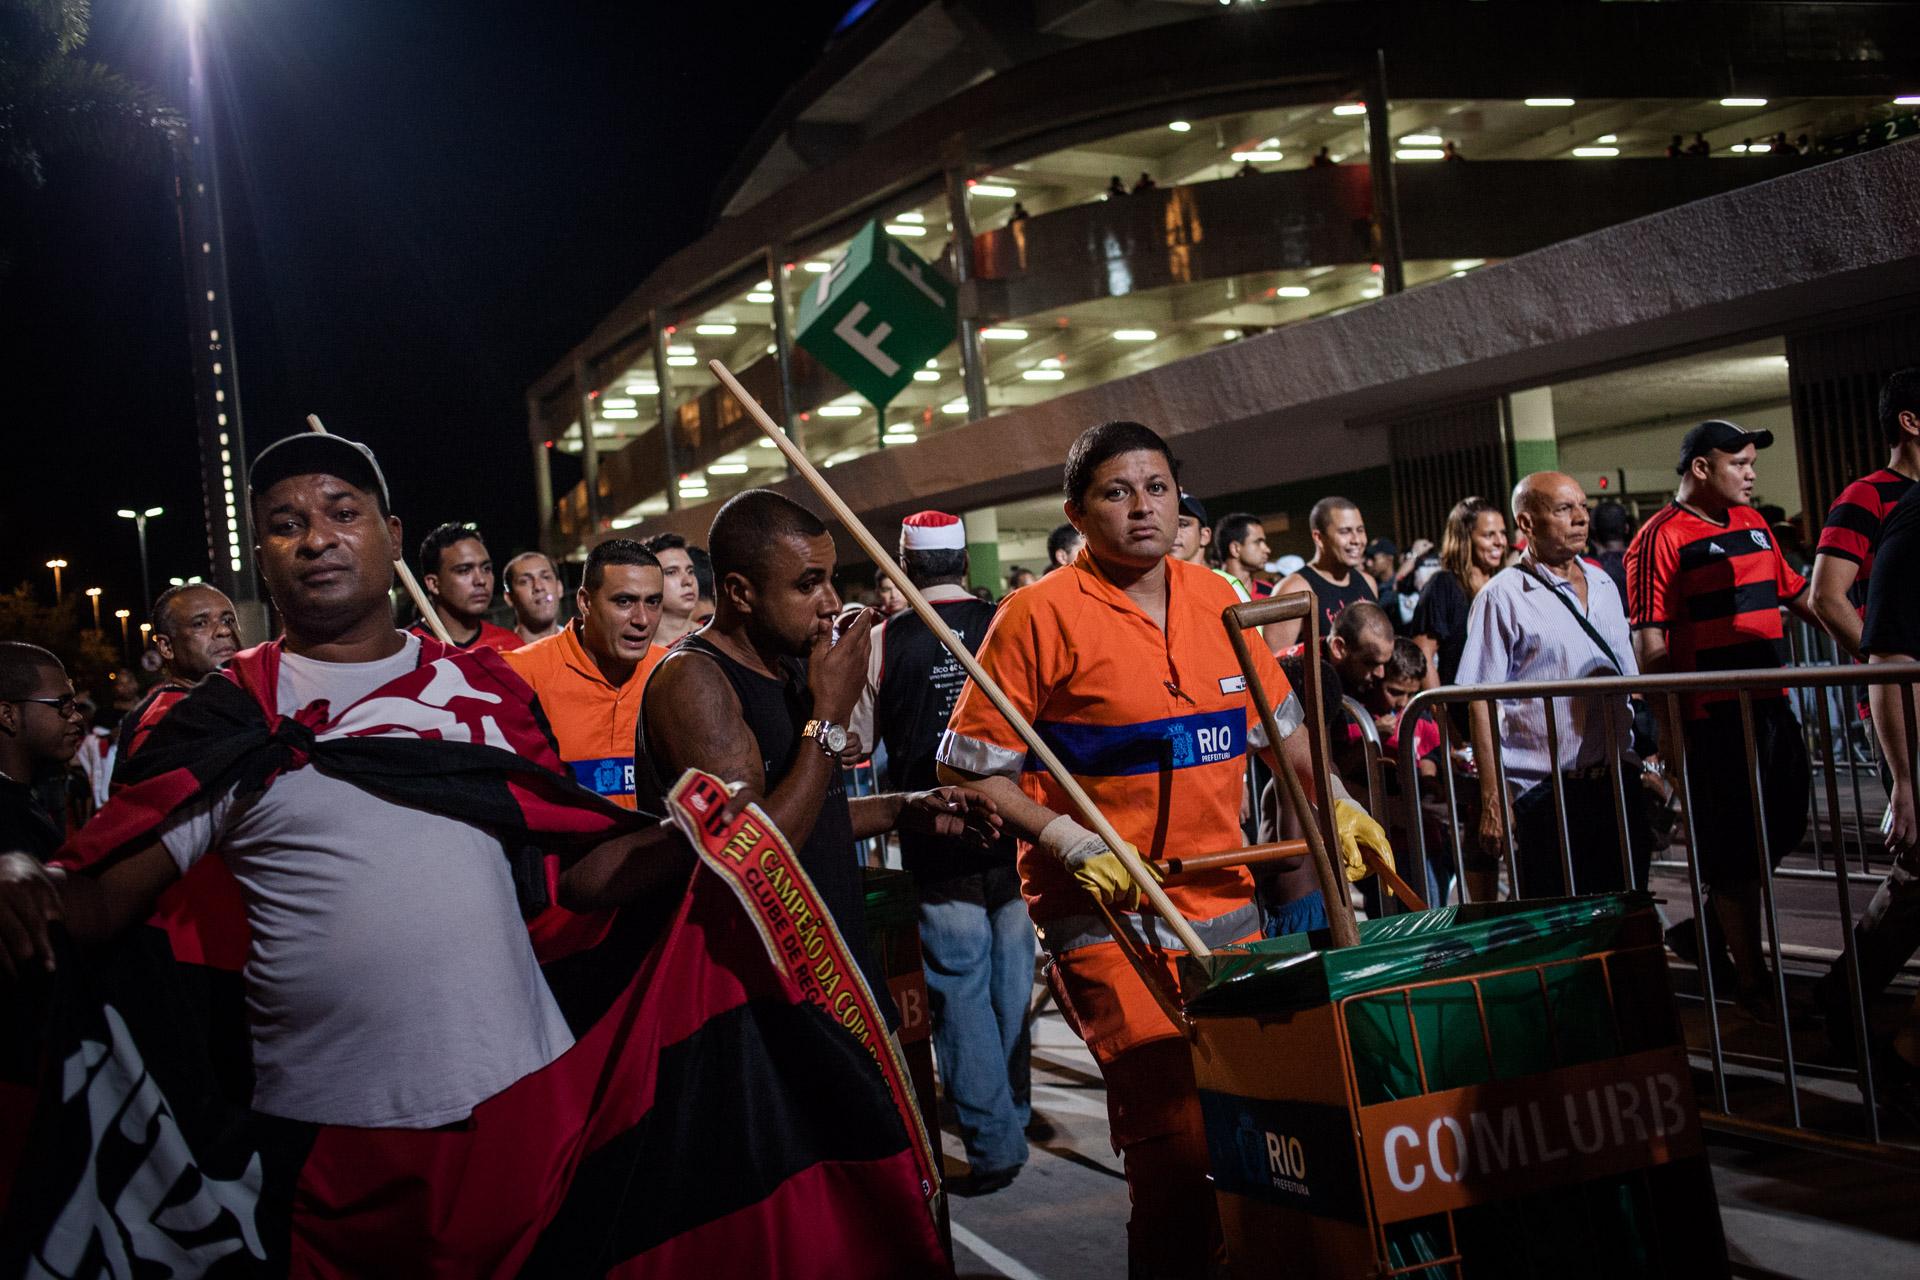 Rio de Janeiro, le 28 Novembre 2013. Garis autour du stade mythique de la Maracana, un jour de match.Rio de Janeiro, November 28, 2013. Garis (sweepers) around the legendary Maracana stadium in a match day.